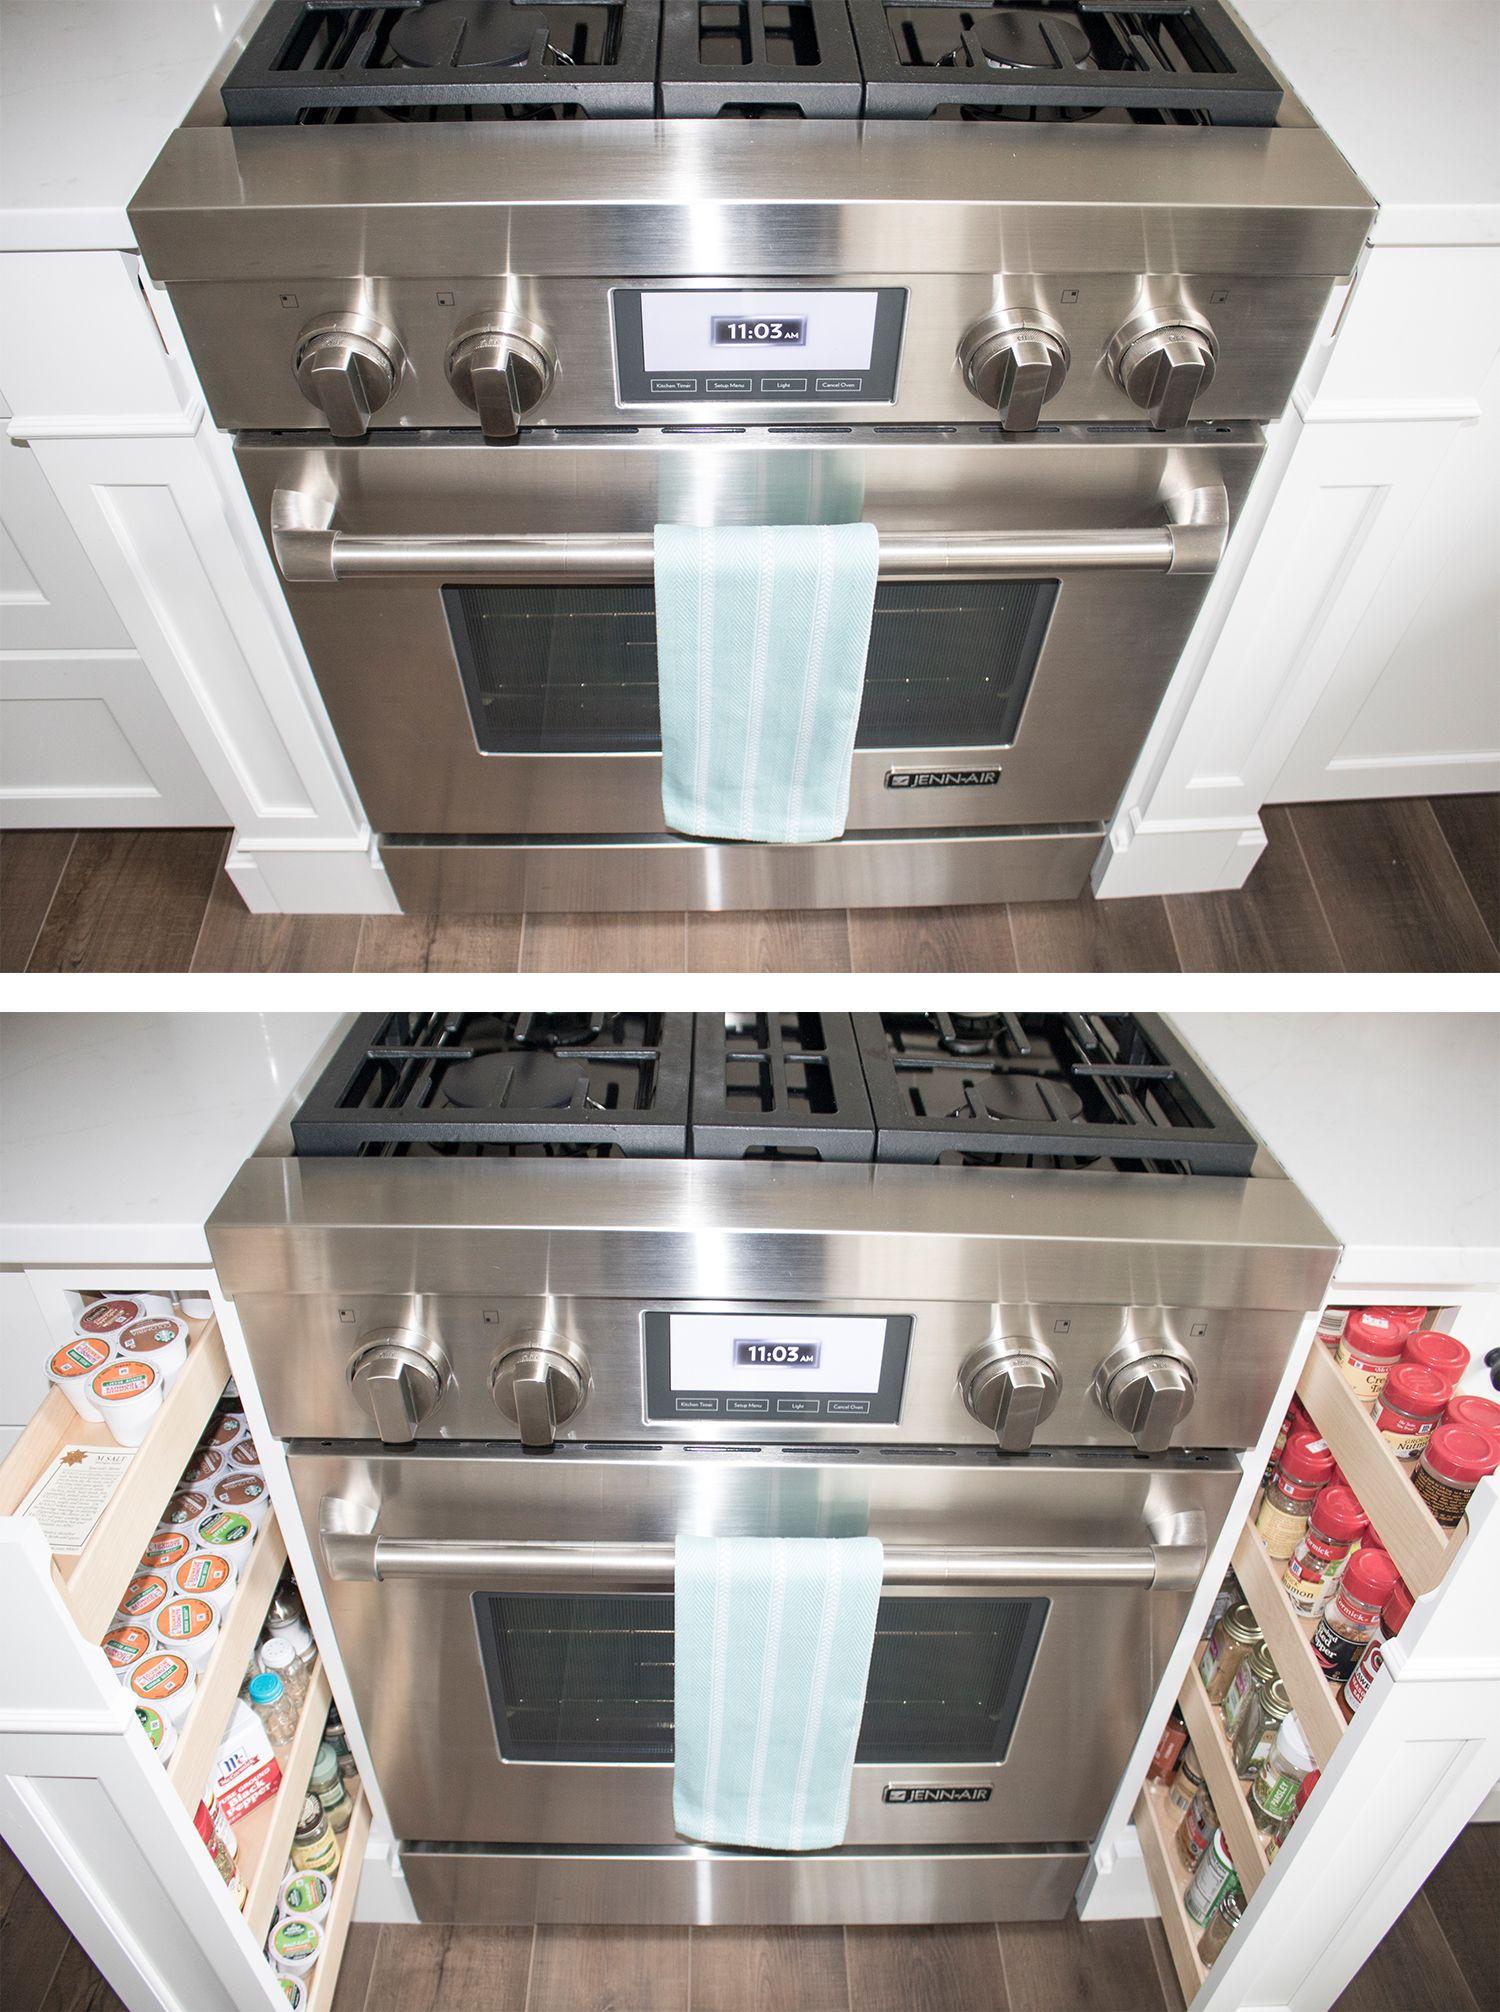 kitchen accessories in 2020 timeless kitchen kitchen accessories cabinetry on kitchen cabinets vertical lines id=40216